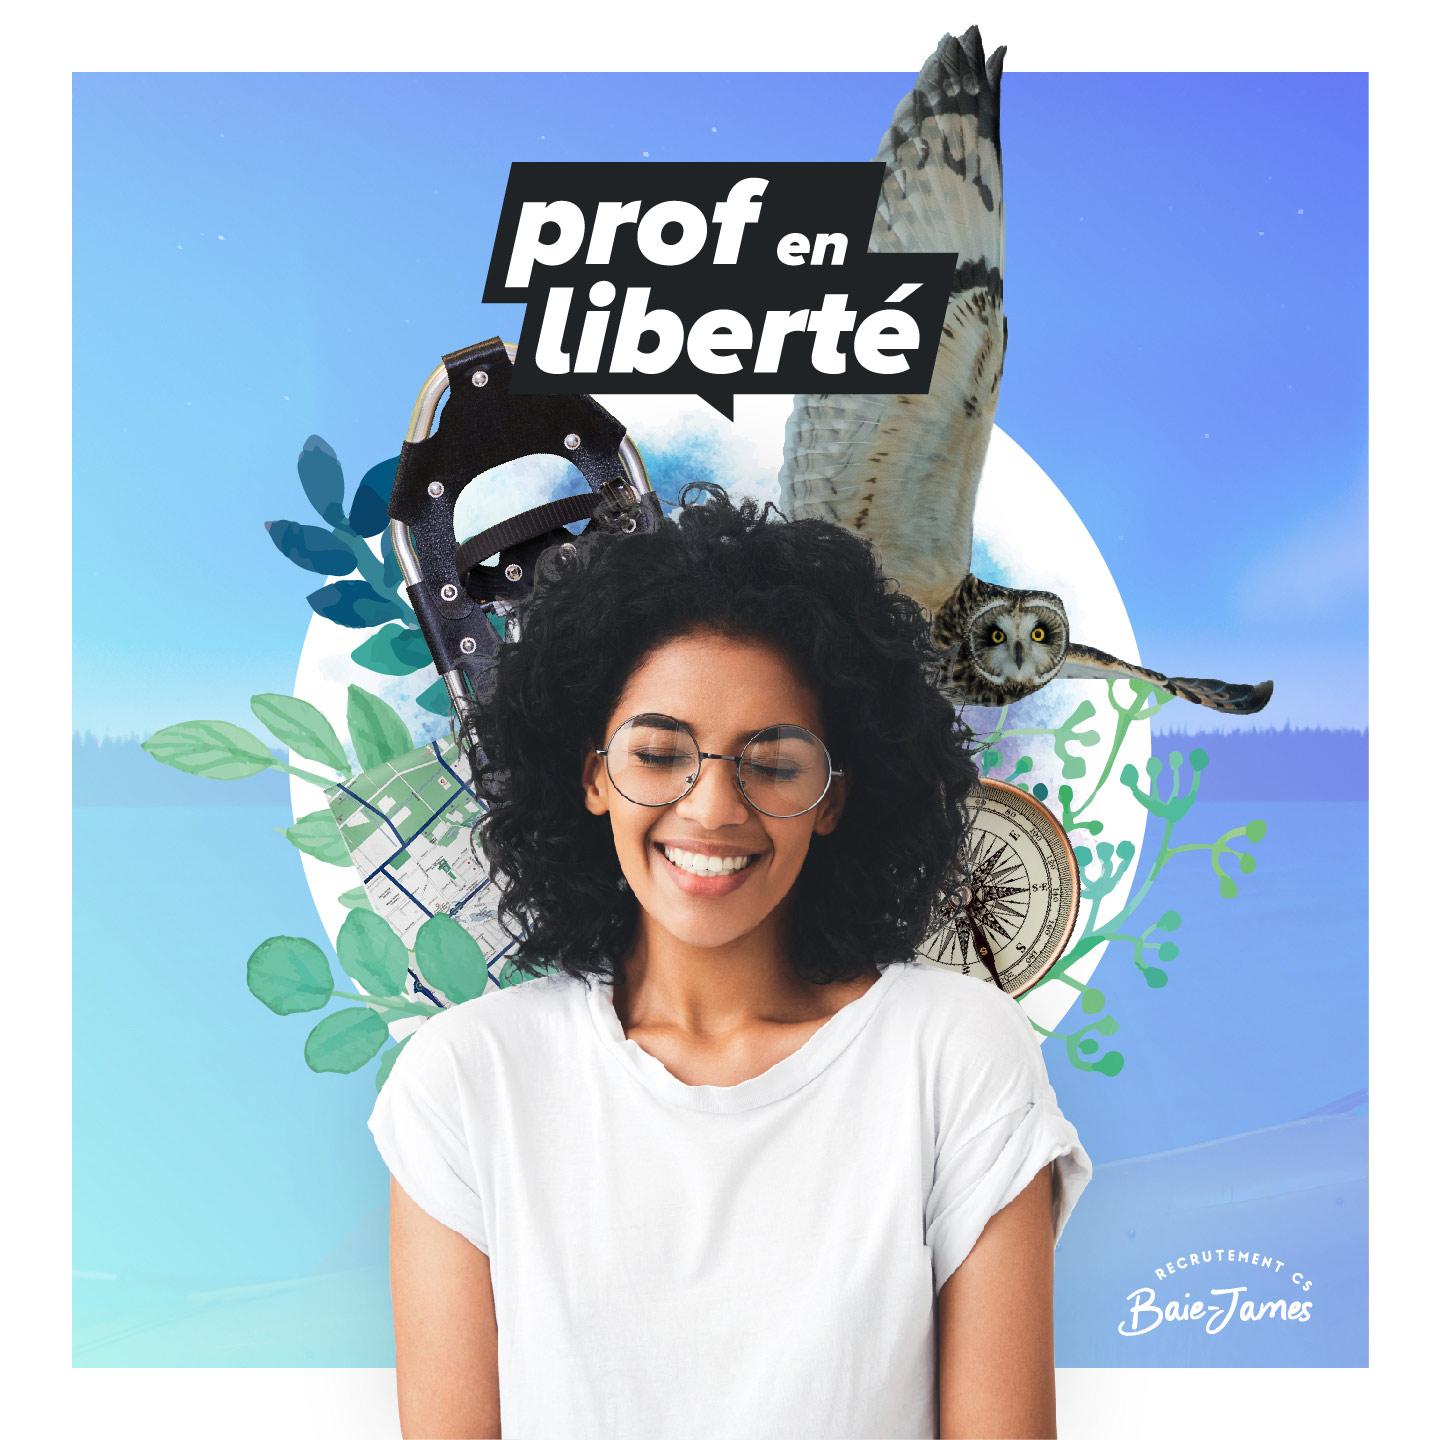 csbj-prof-en-liberte-03